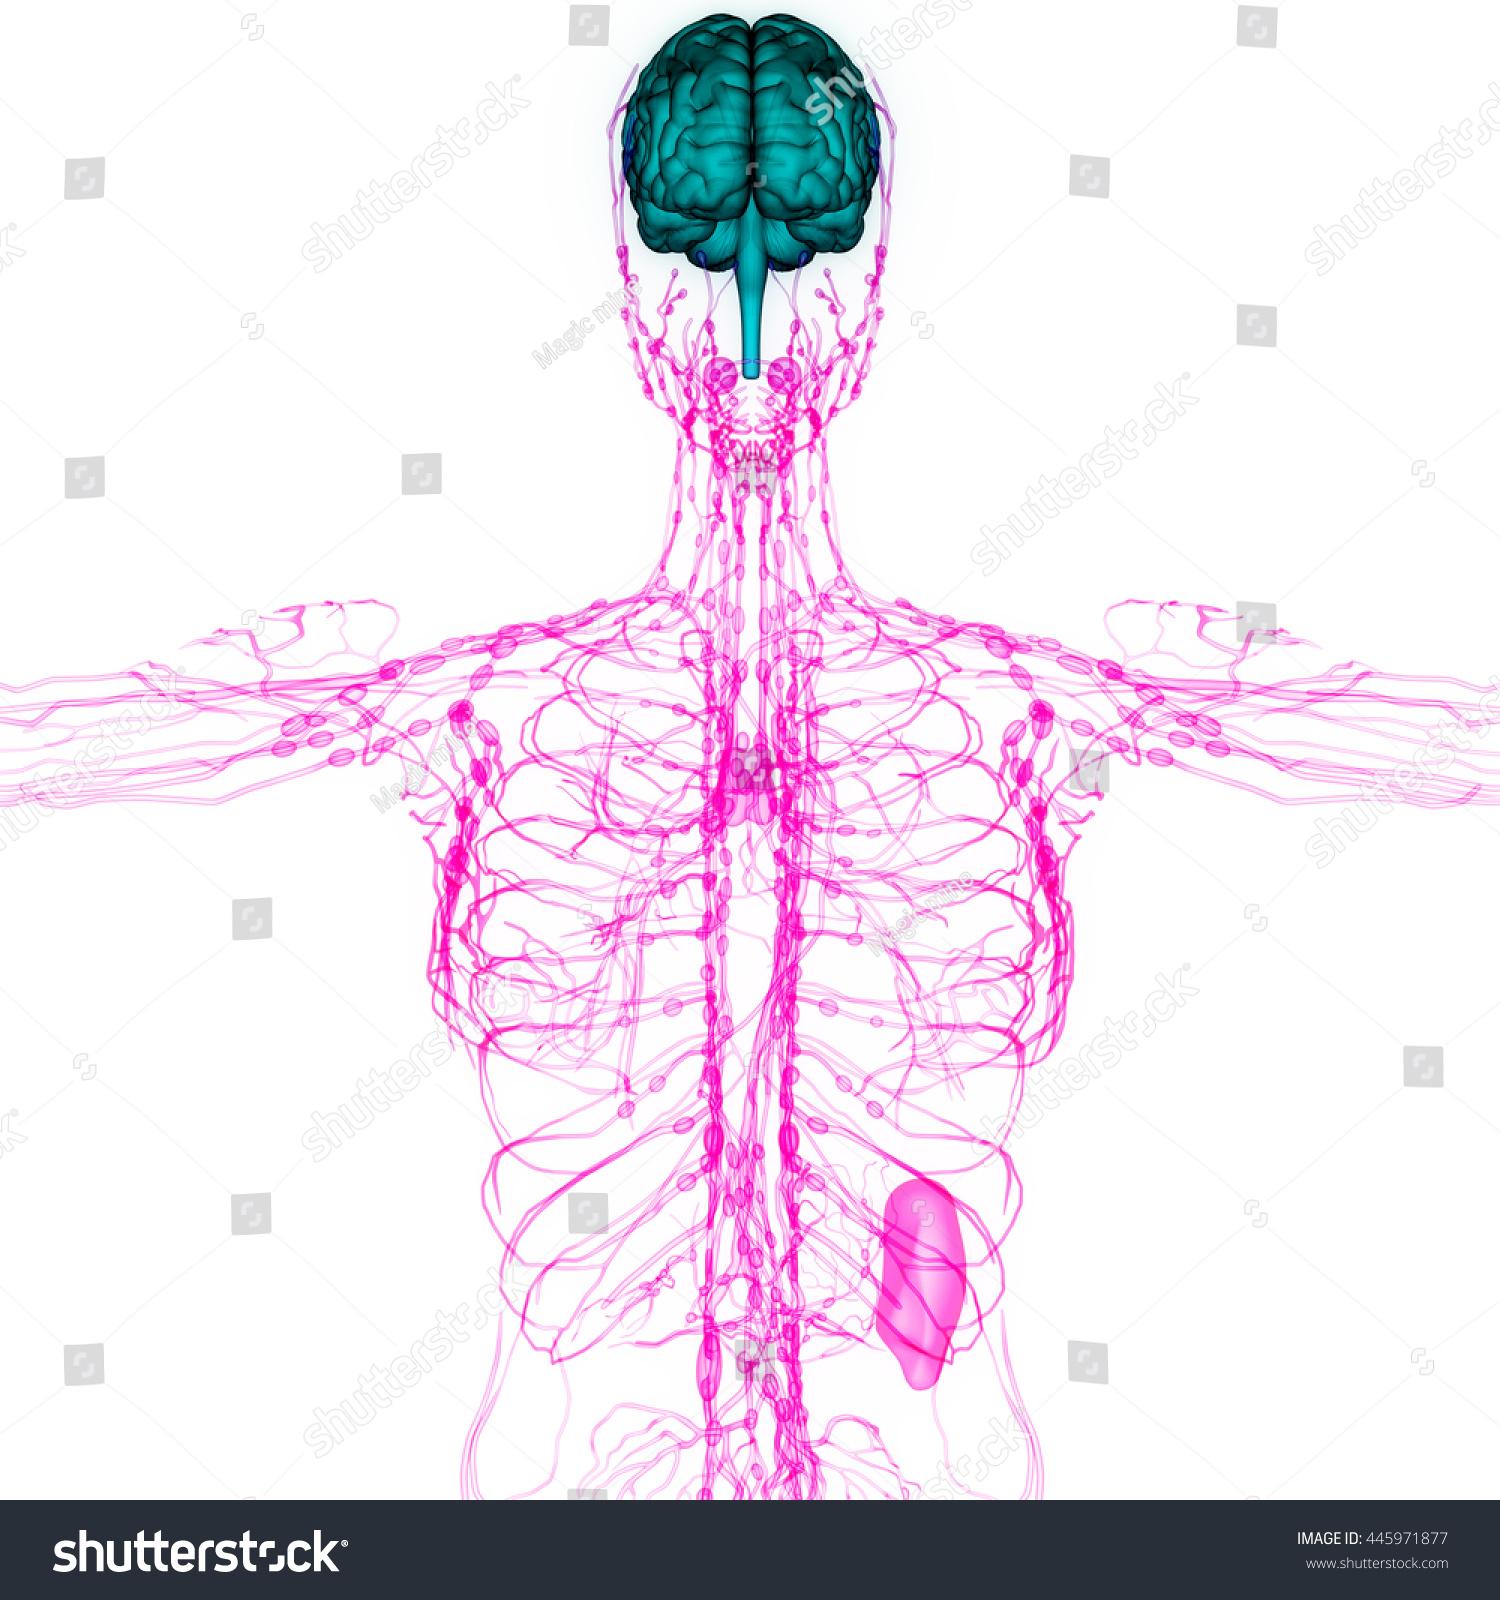 Human Brain Nerves Lymph Nodes Anatomy Stock Illustration 445971877 ...